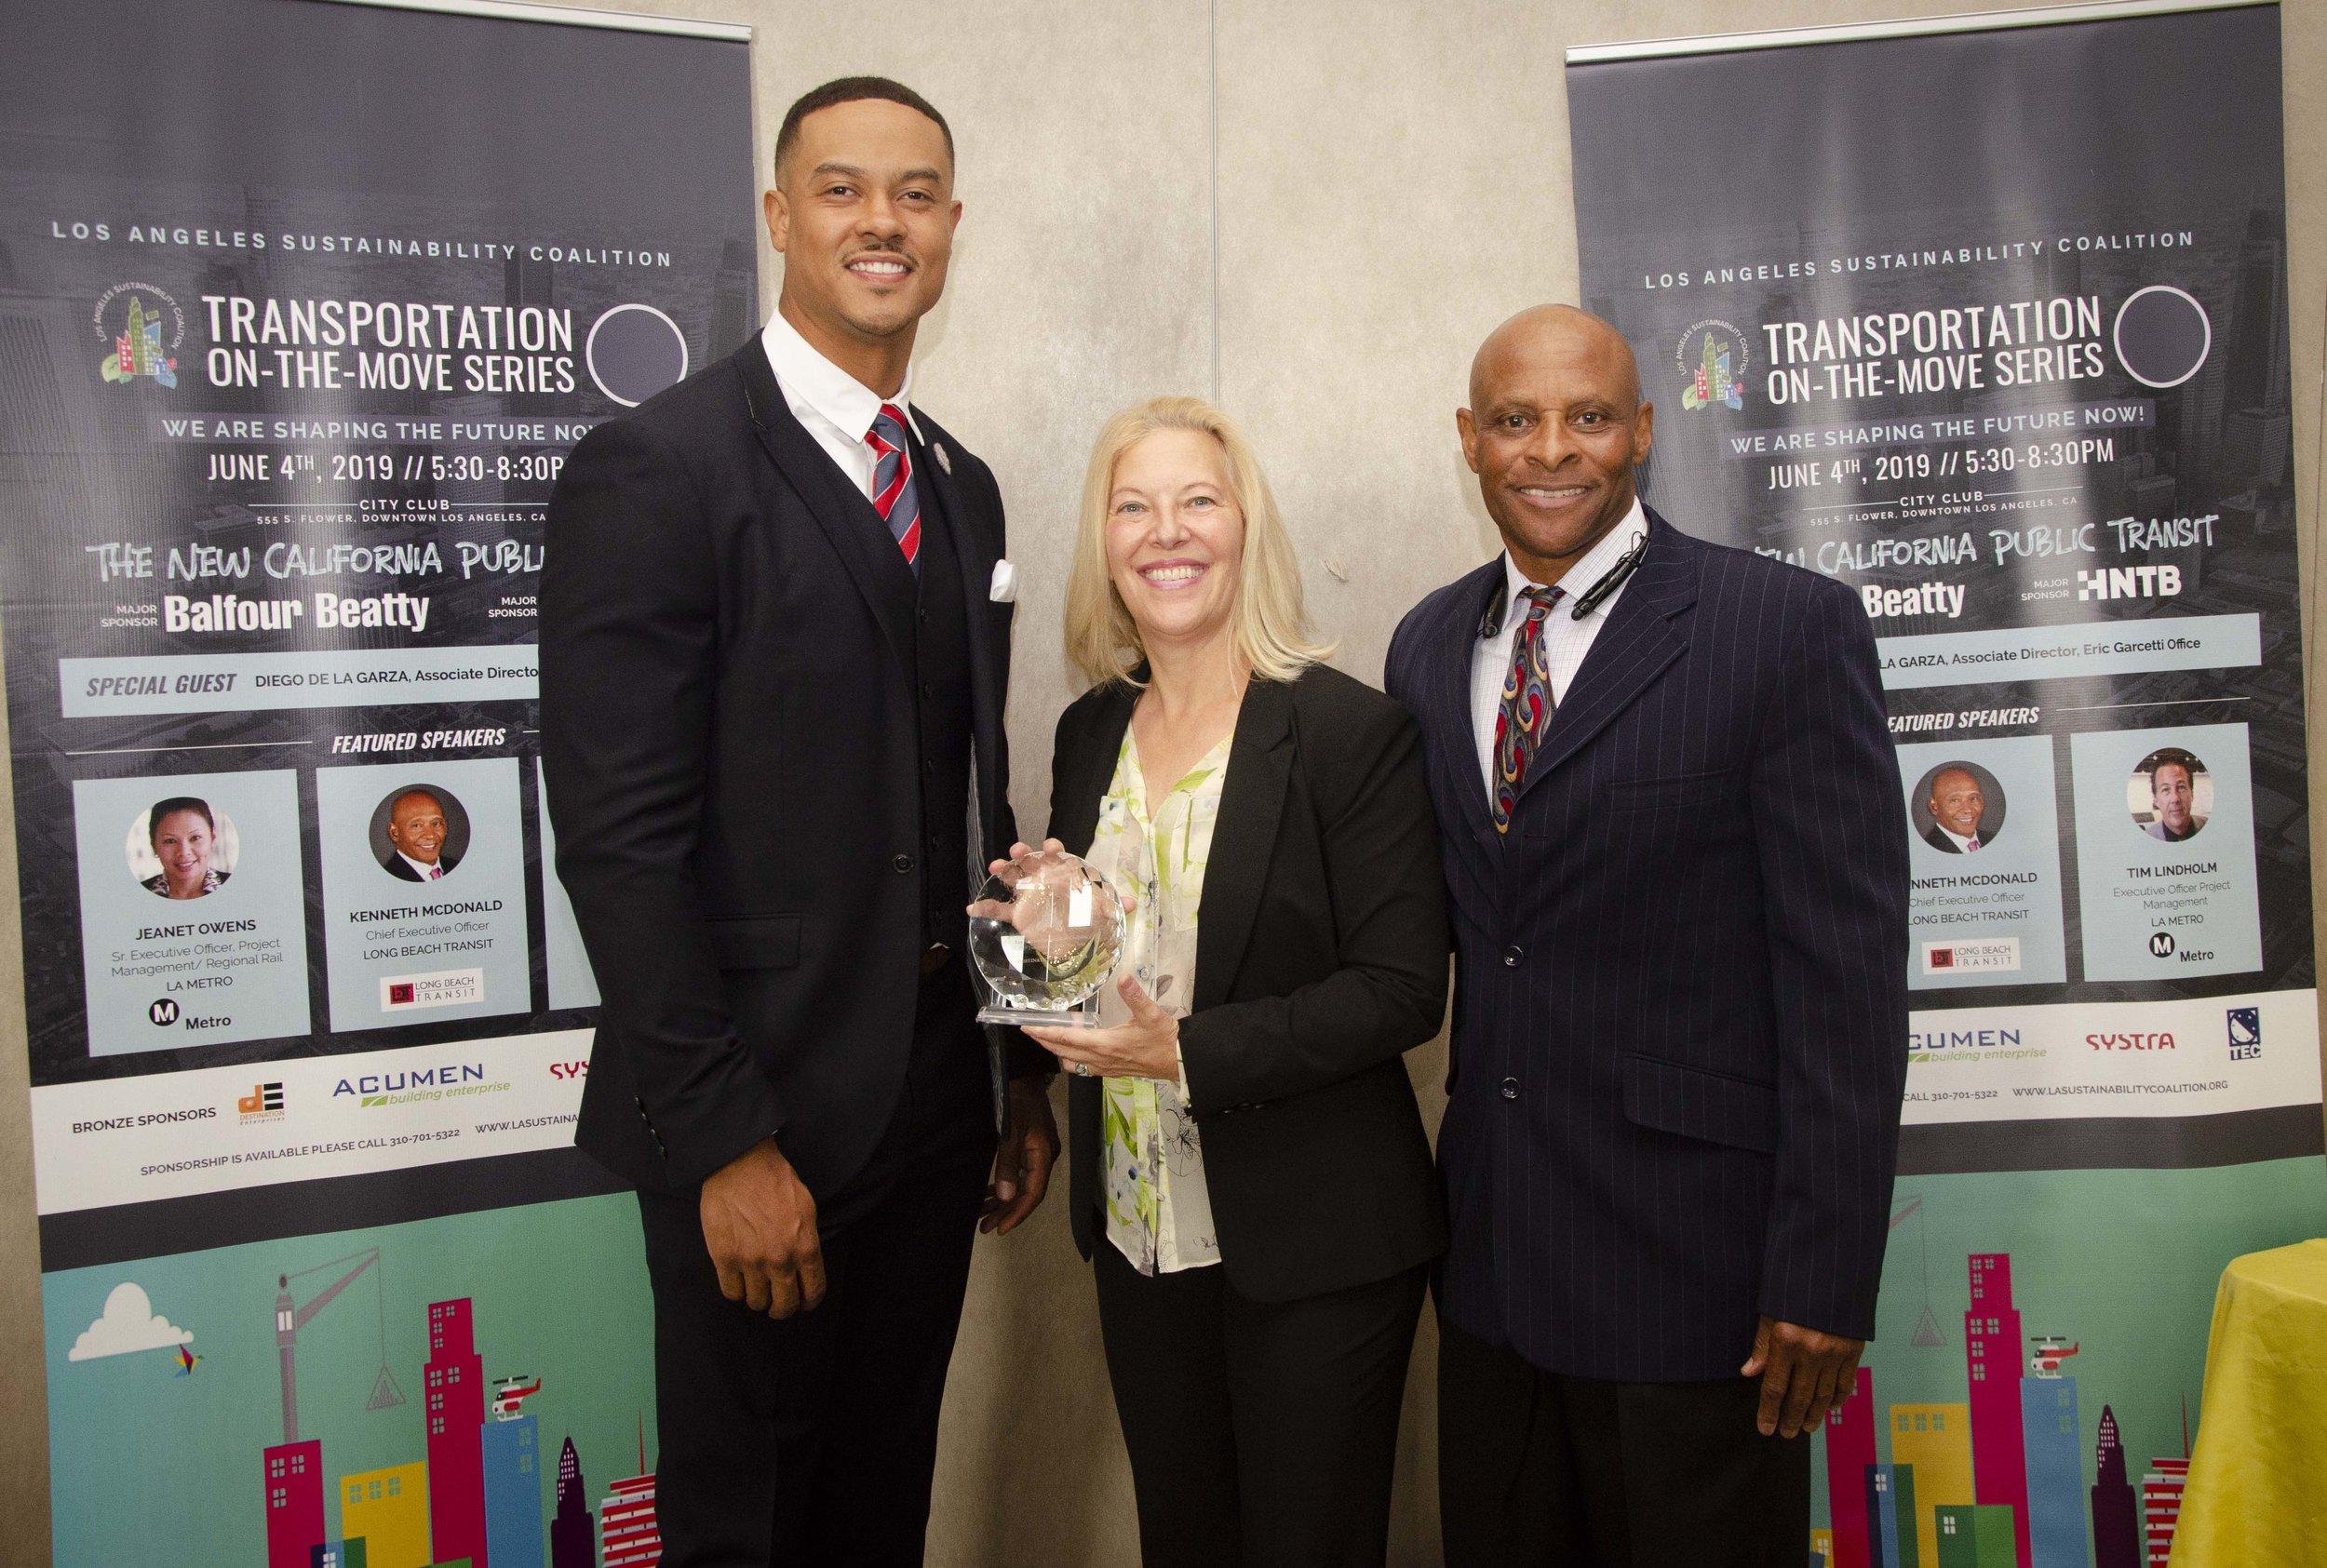 Marcy Szarama  and  James Penn  receiving an award st LASC event 6/4/19